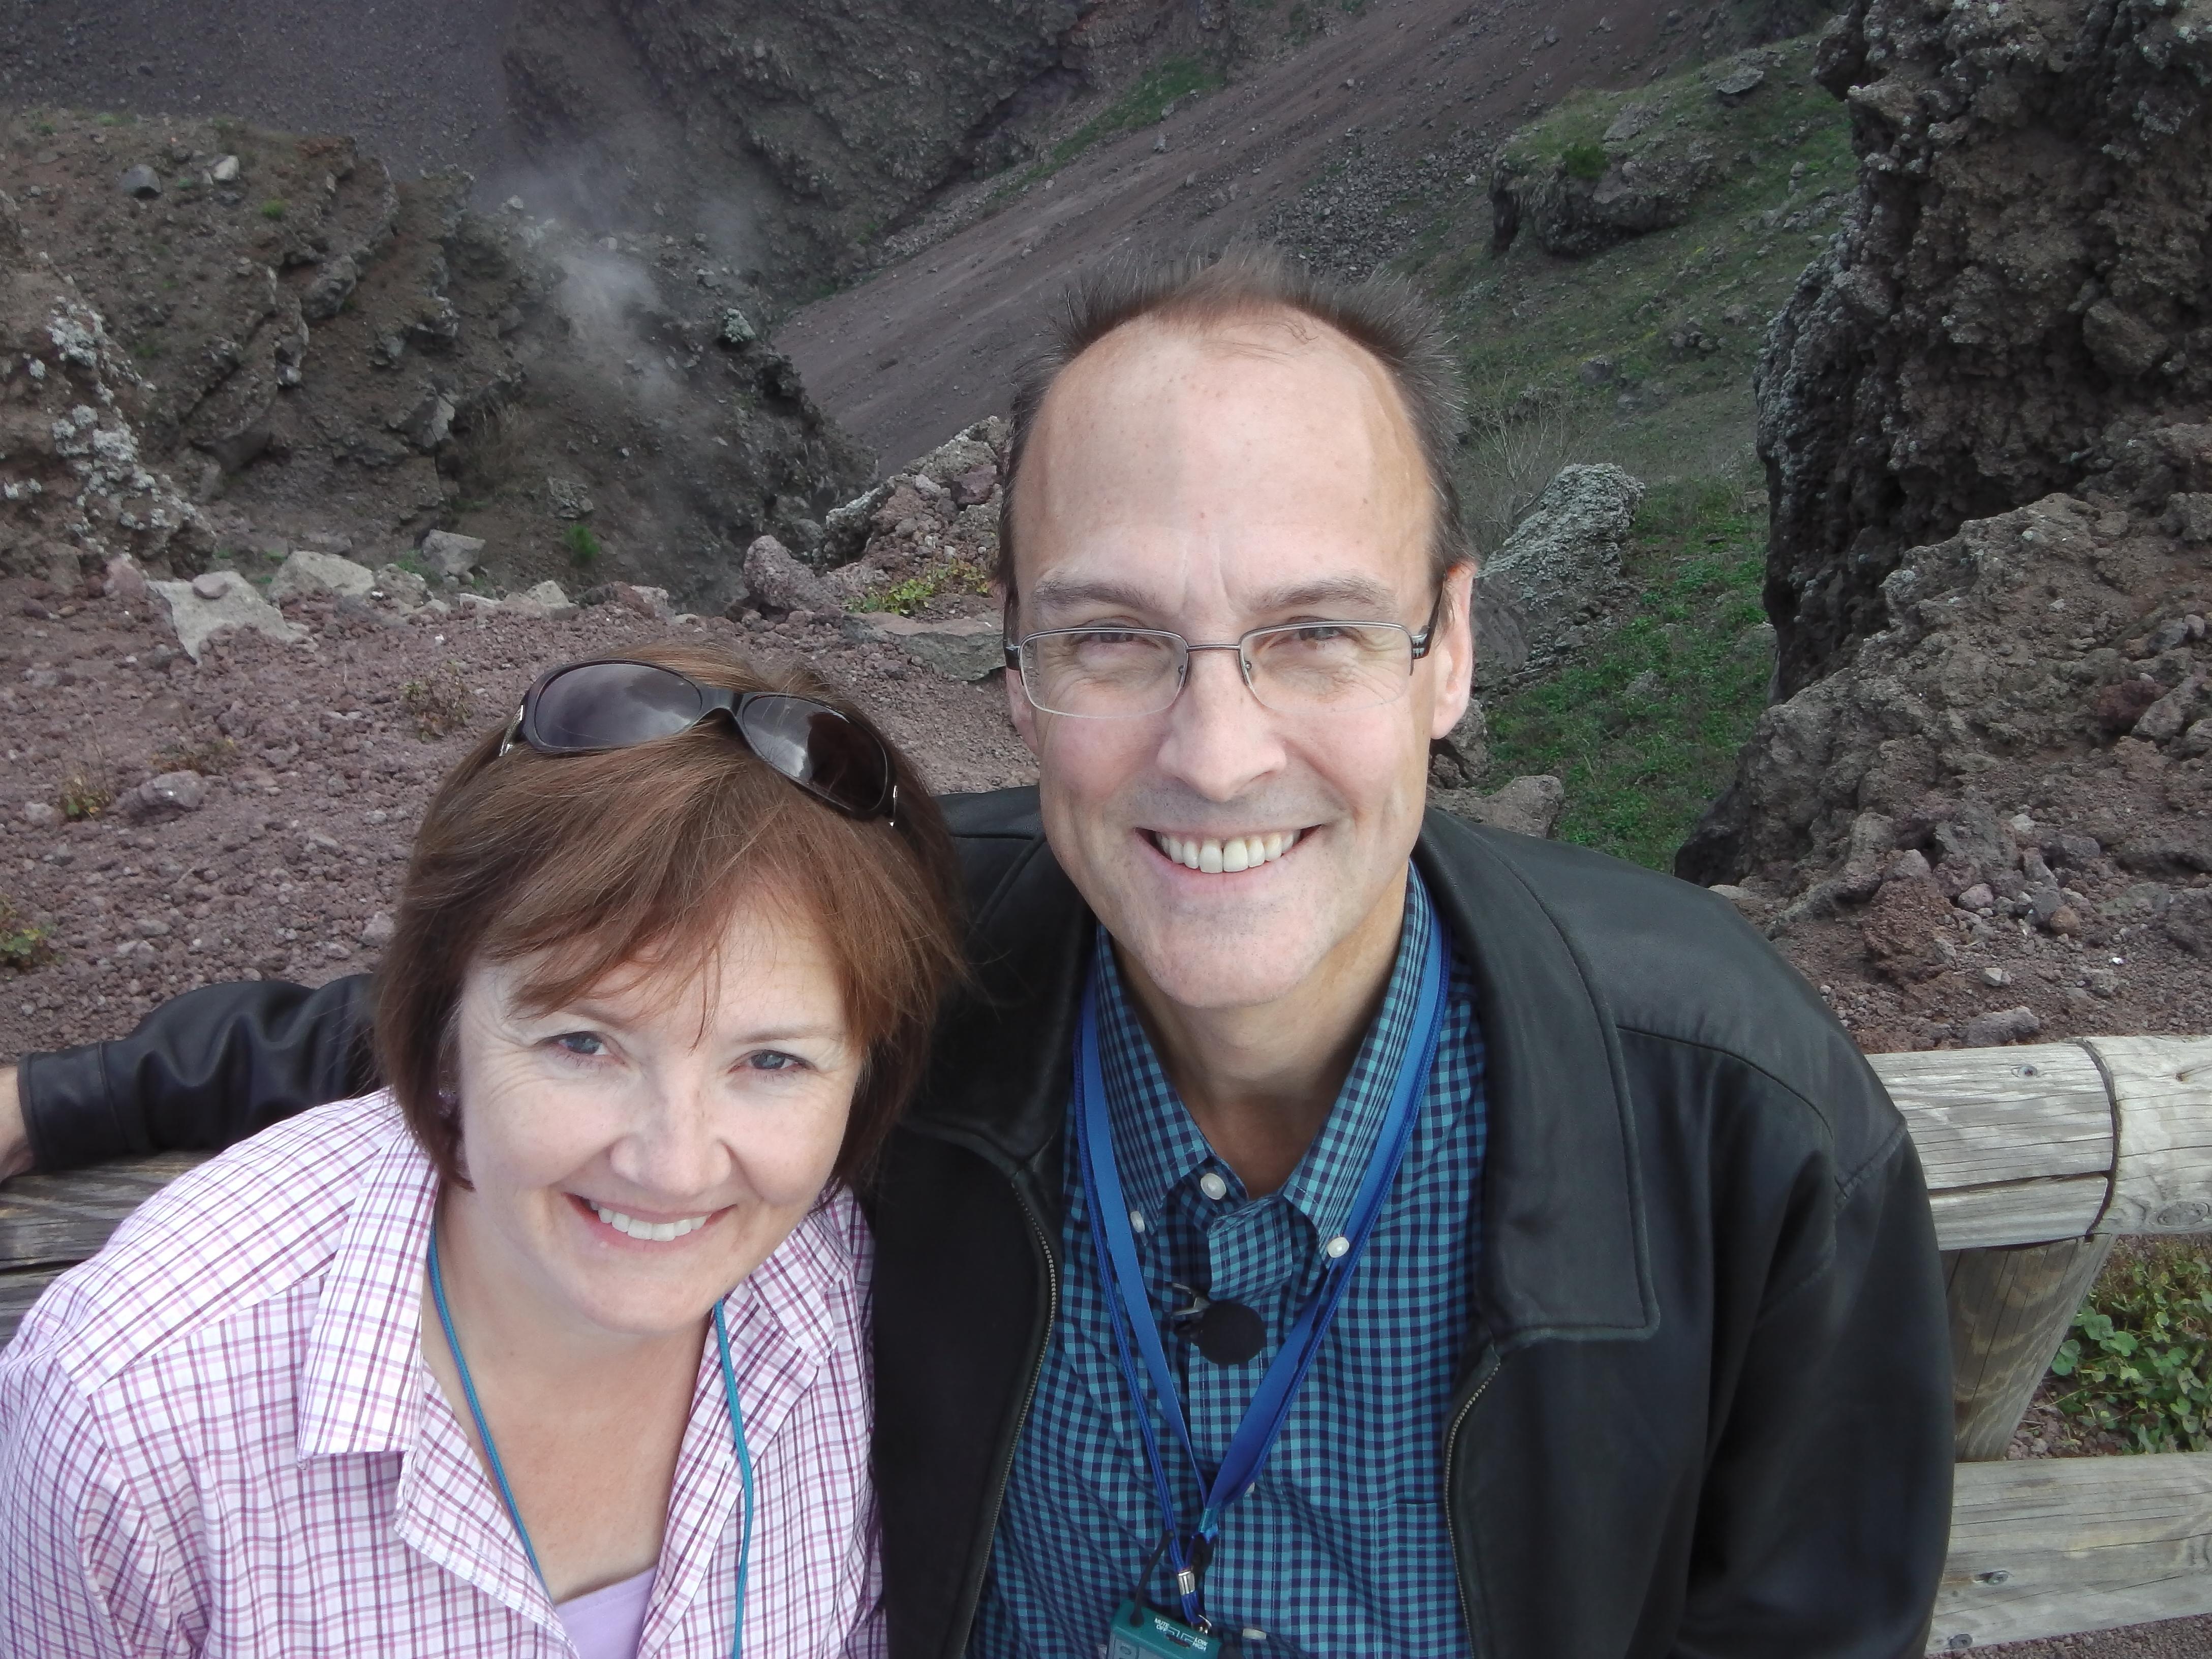 Vicki & Douglas in front of the crater of Vesuvius